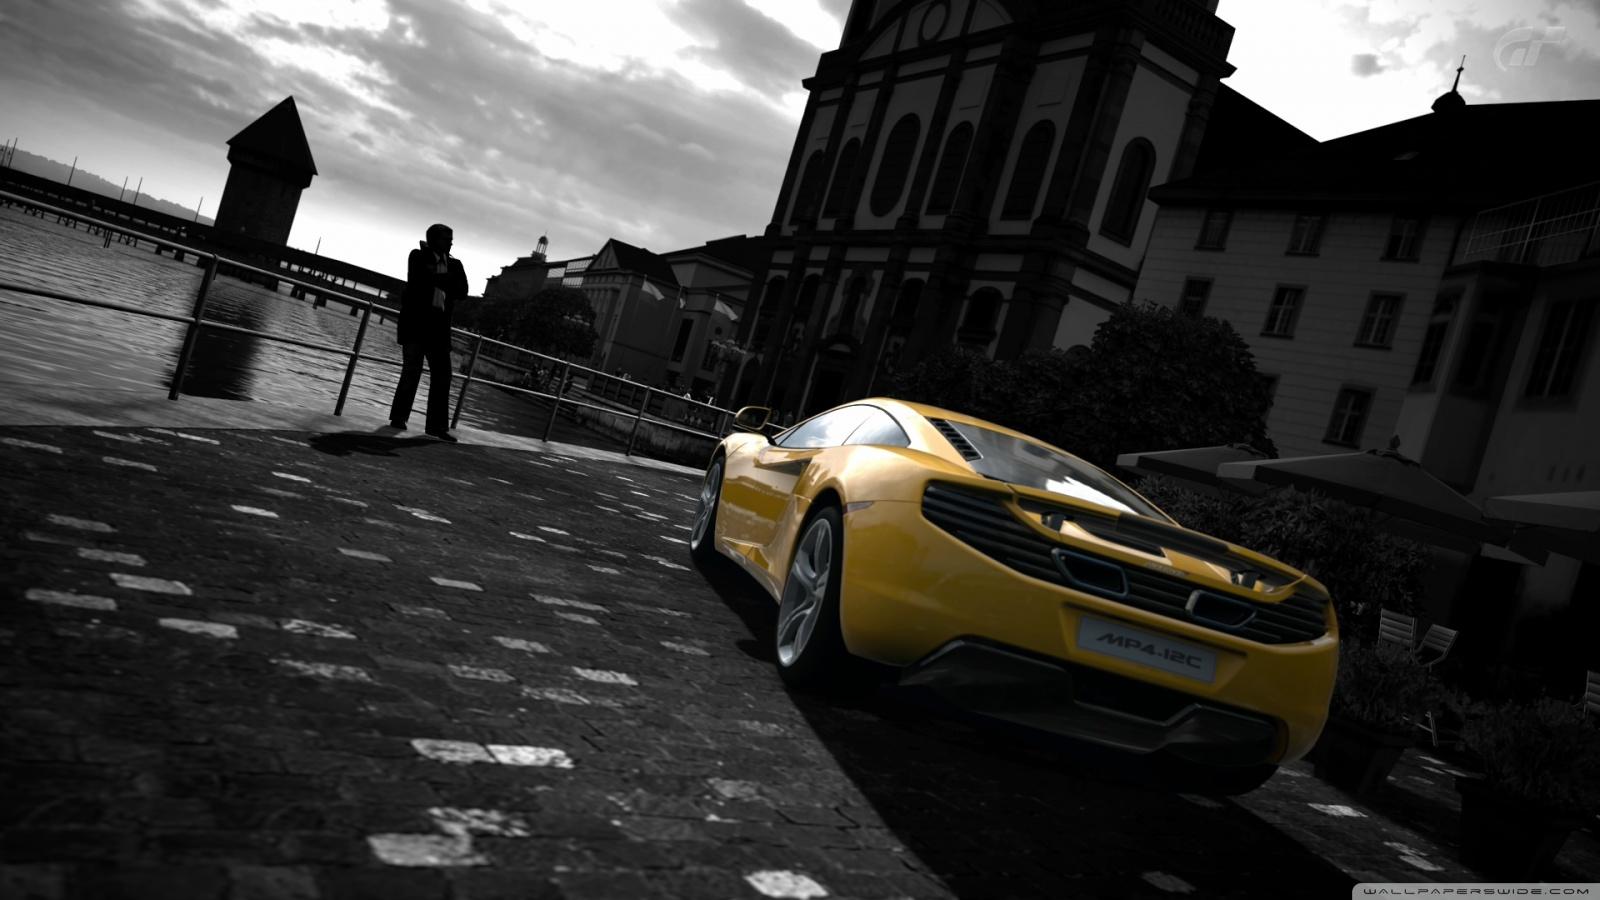 Gran Turismo Wallpaper Hd: Freaking Spot: Gran Turismo Full HD 1080p Wallpapers